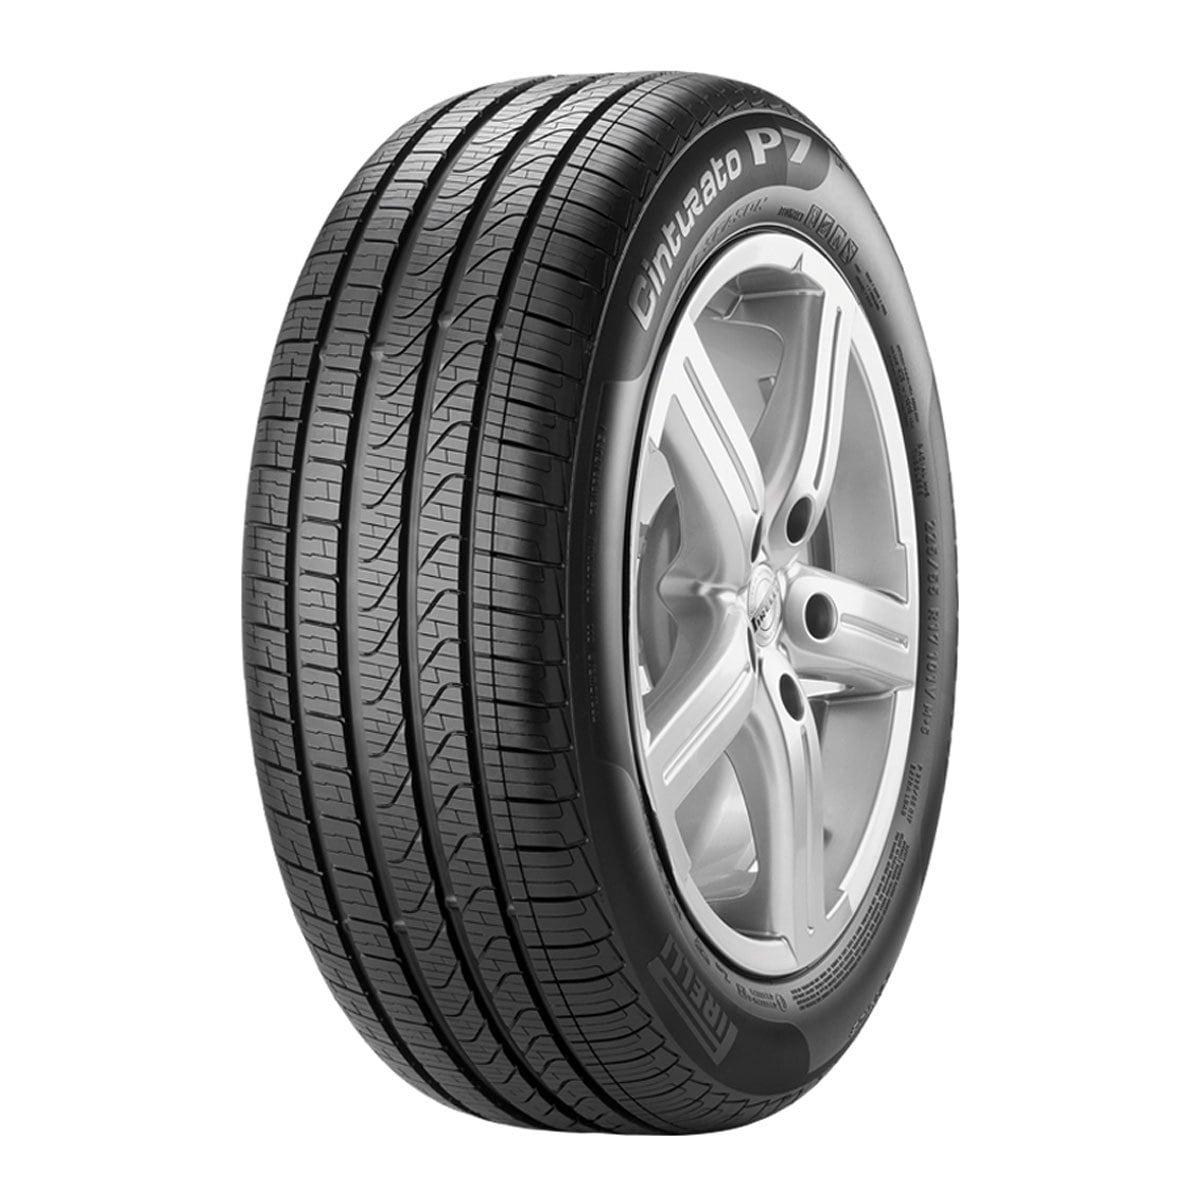 Spllanta 235 40 R19 P7 As 96V Pirelli